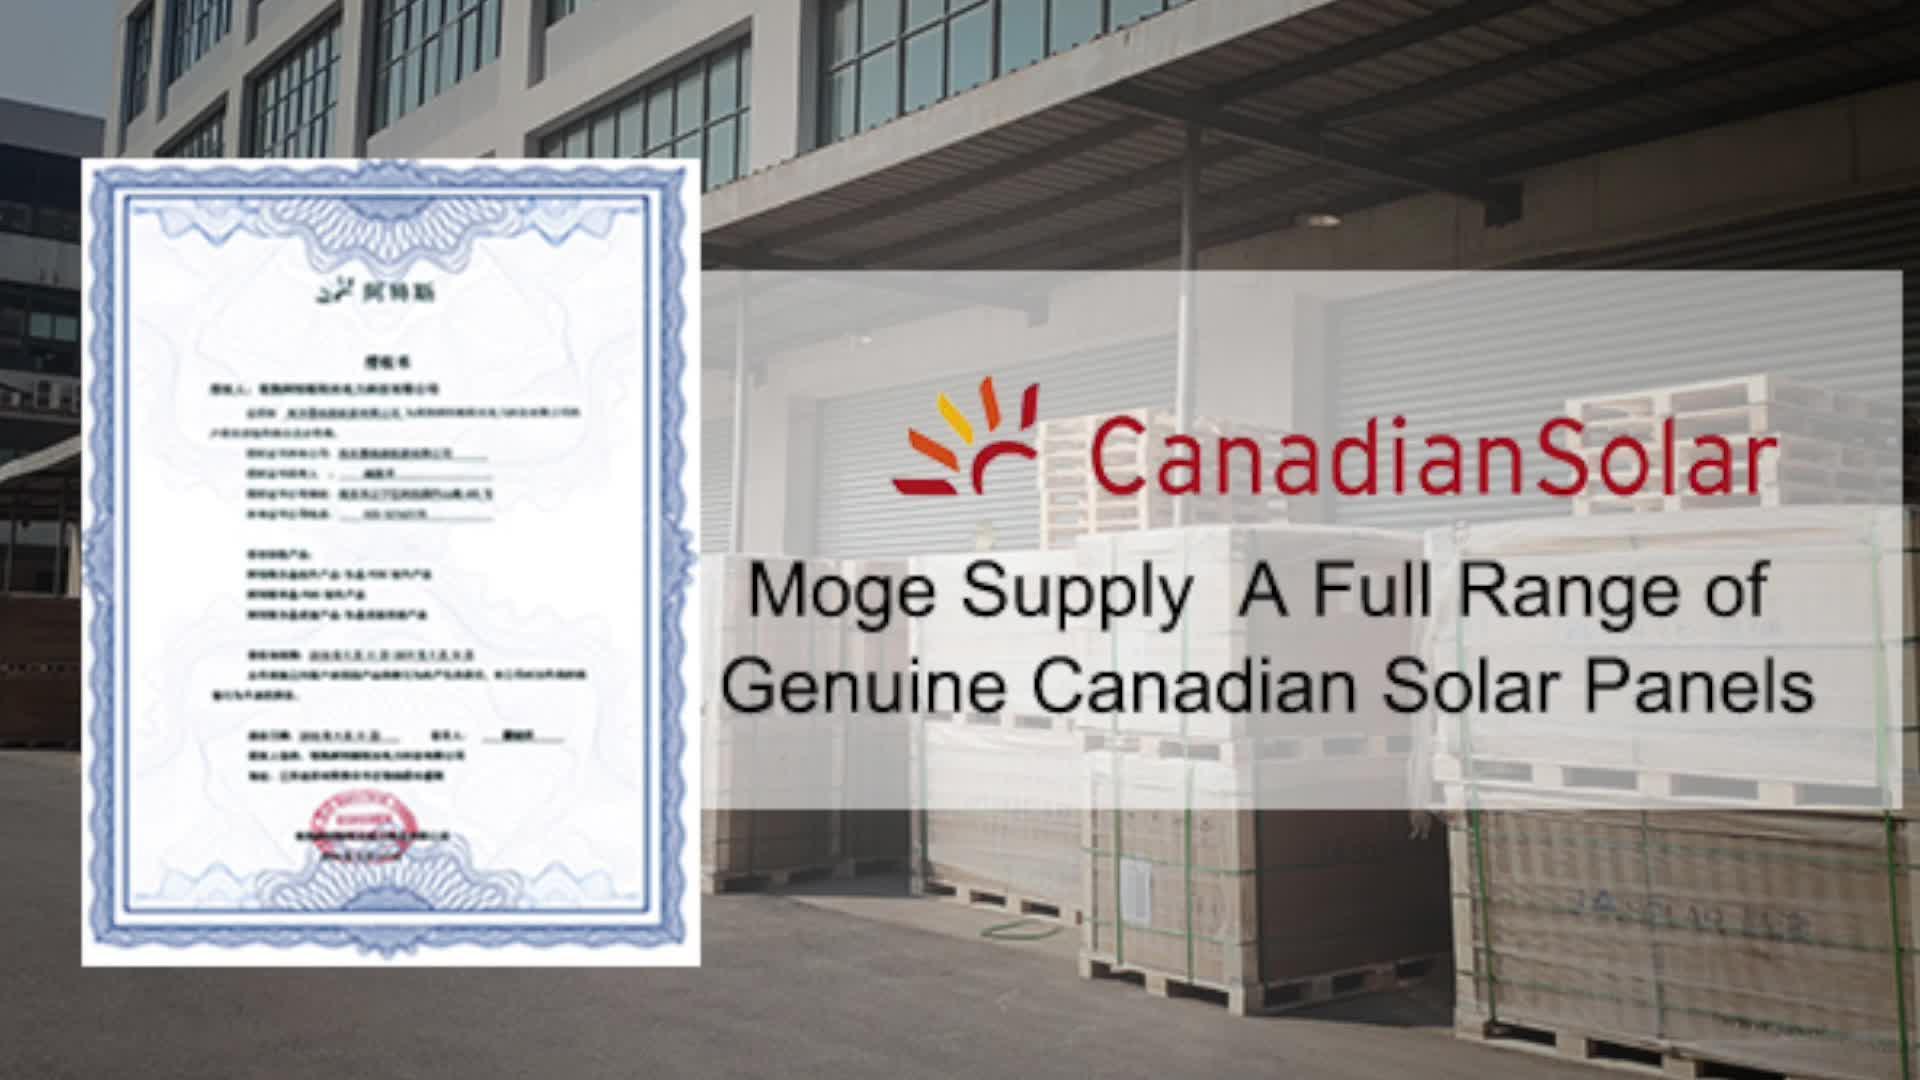 Canadese Zonnepanelen Distributeur Pv Zonnepaneel 370 W 365 W 360 W 400W 410W 420W 425W 430W 435W Voor Pv Zonnepaneel Systeem Thuis